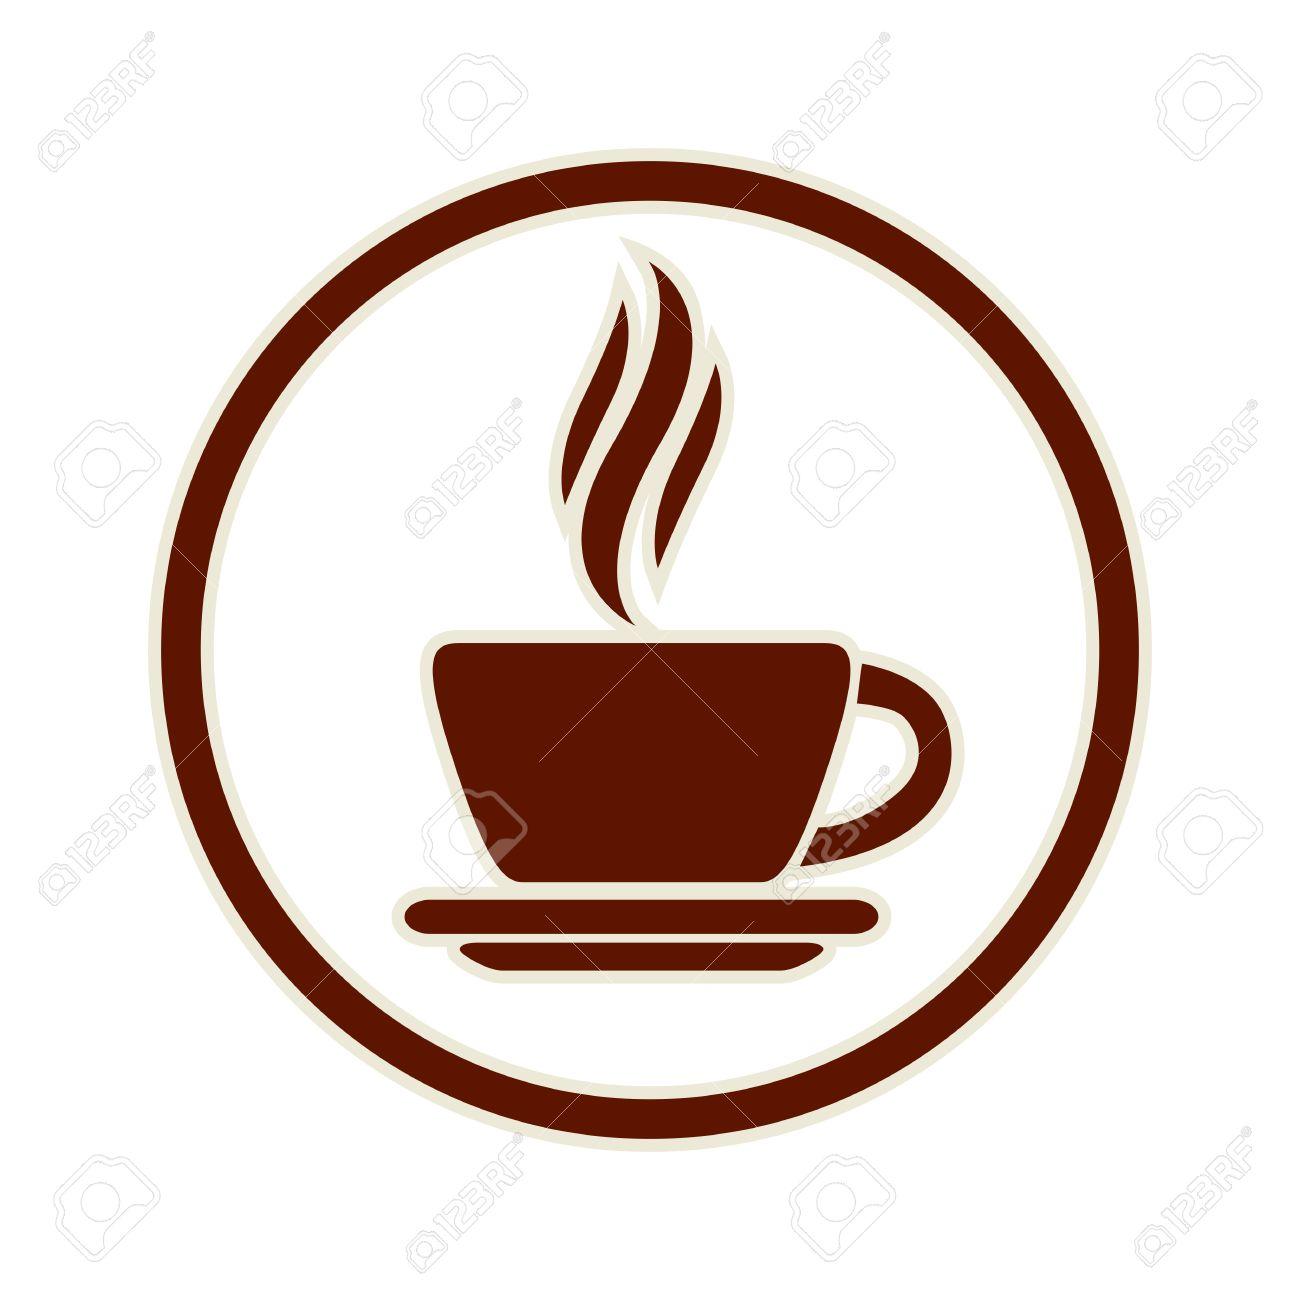 Coffee cup icon, vector. Stock Vector - 32721649